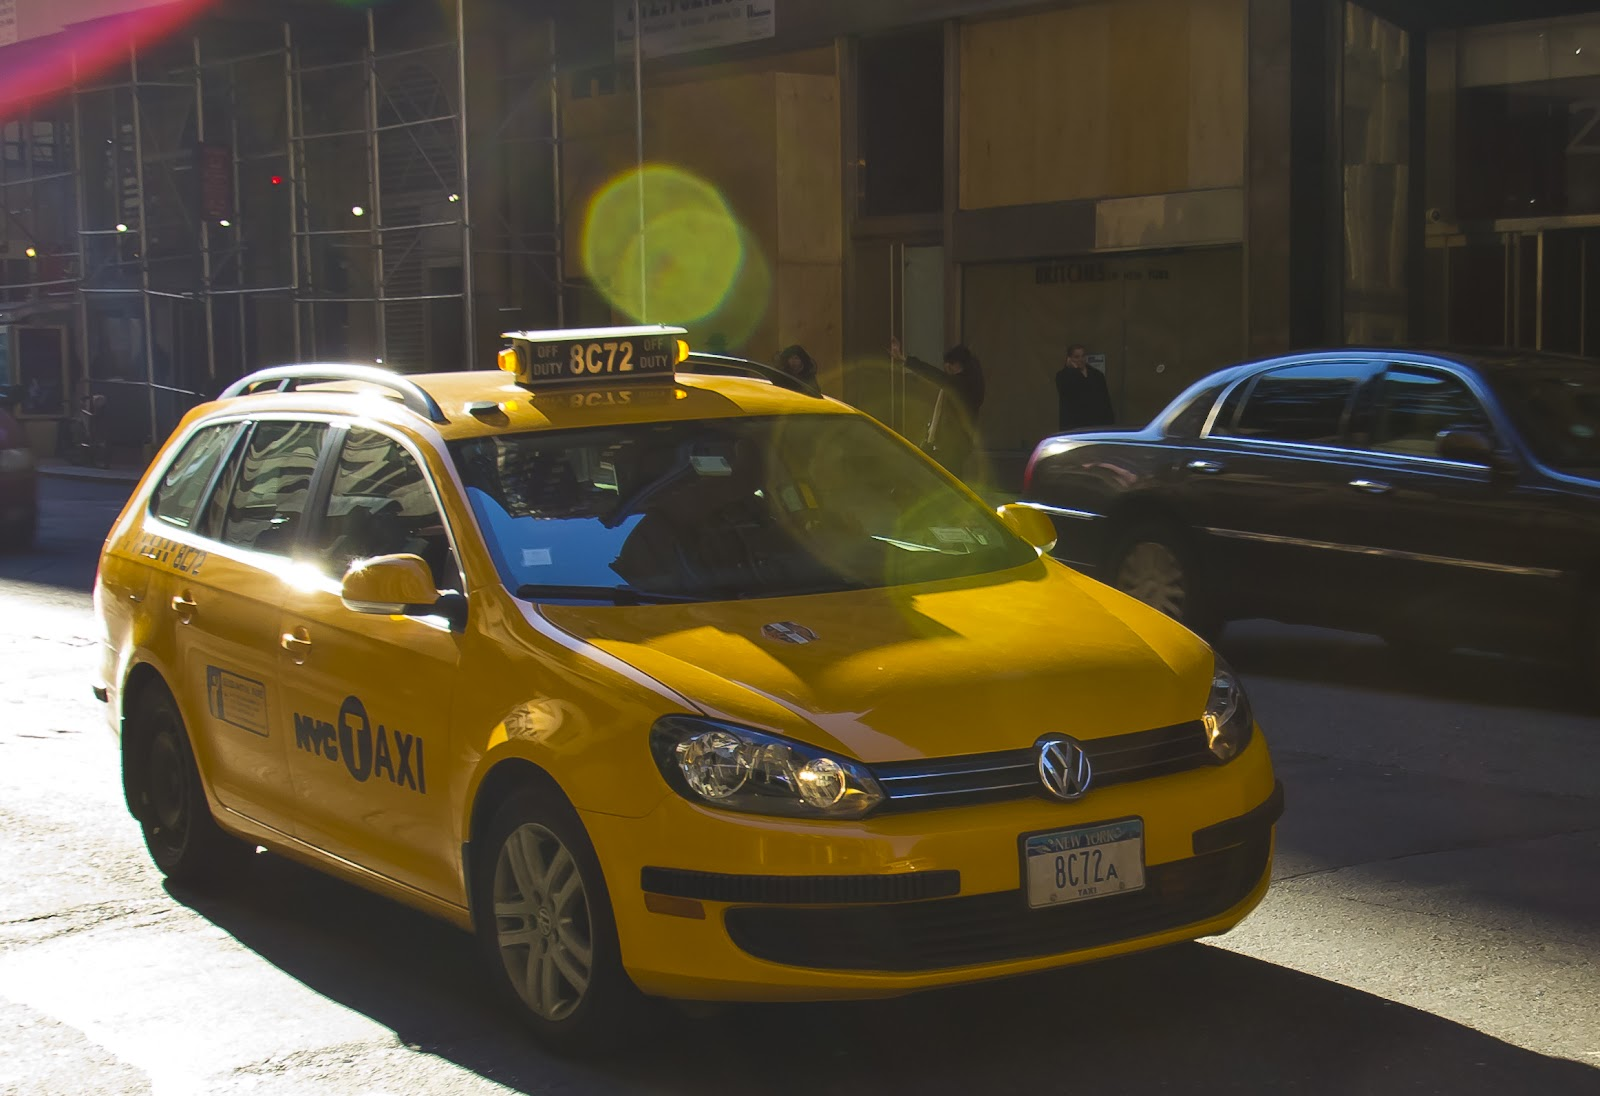 genickstarre nyc yellow cabs oder warum sind taxis gelb. Black Bedroom Furniture Sets. Home Design Ideas